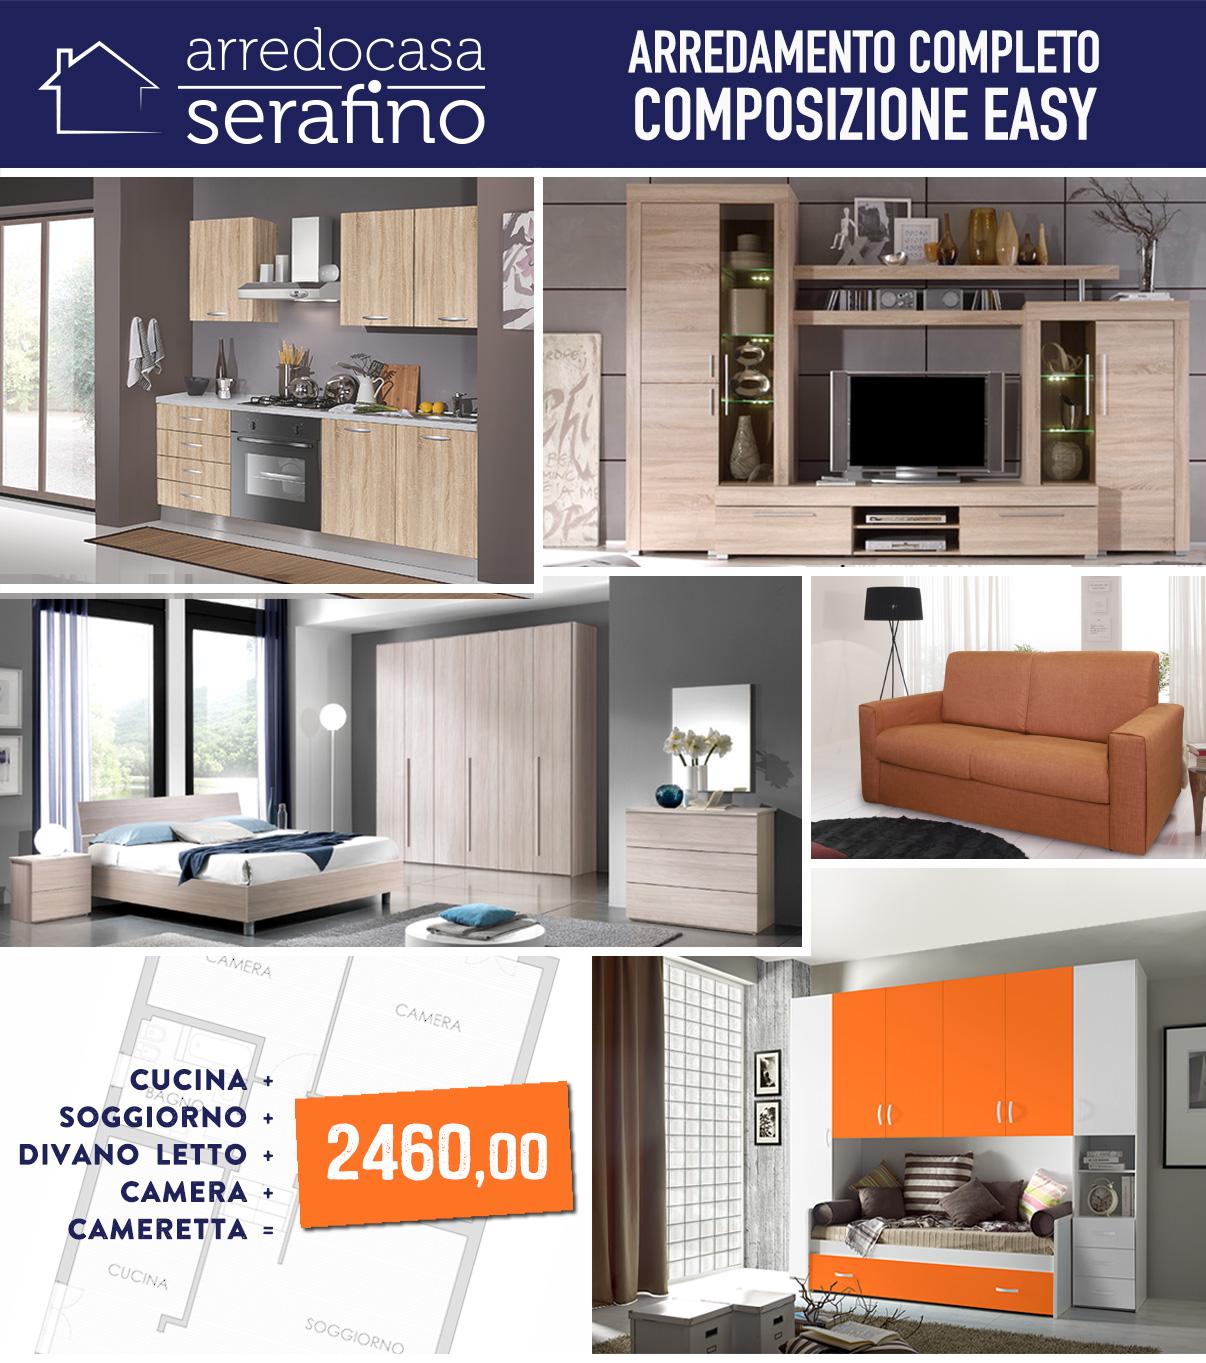 Arredamento completo easy arredocasa serafino for Arredamento completo moderno